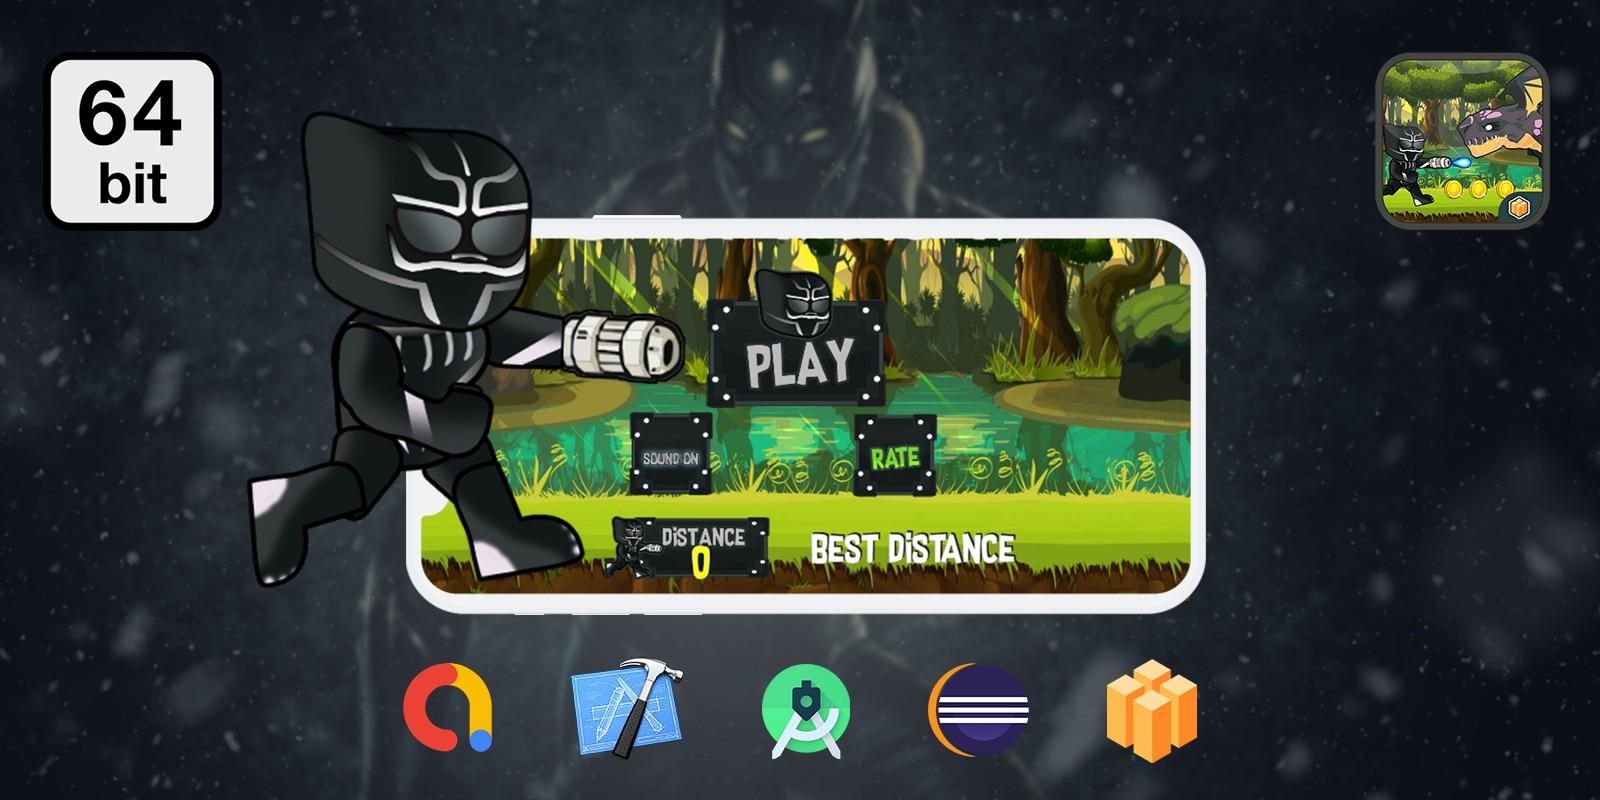 Black Ranger Endless 64 bit  - Buildbox Template